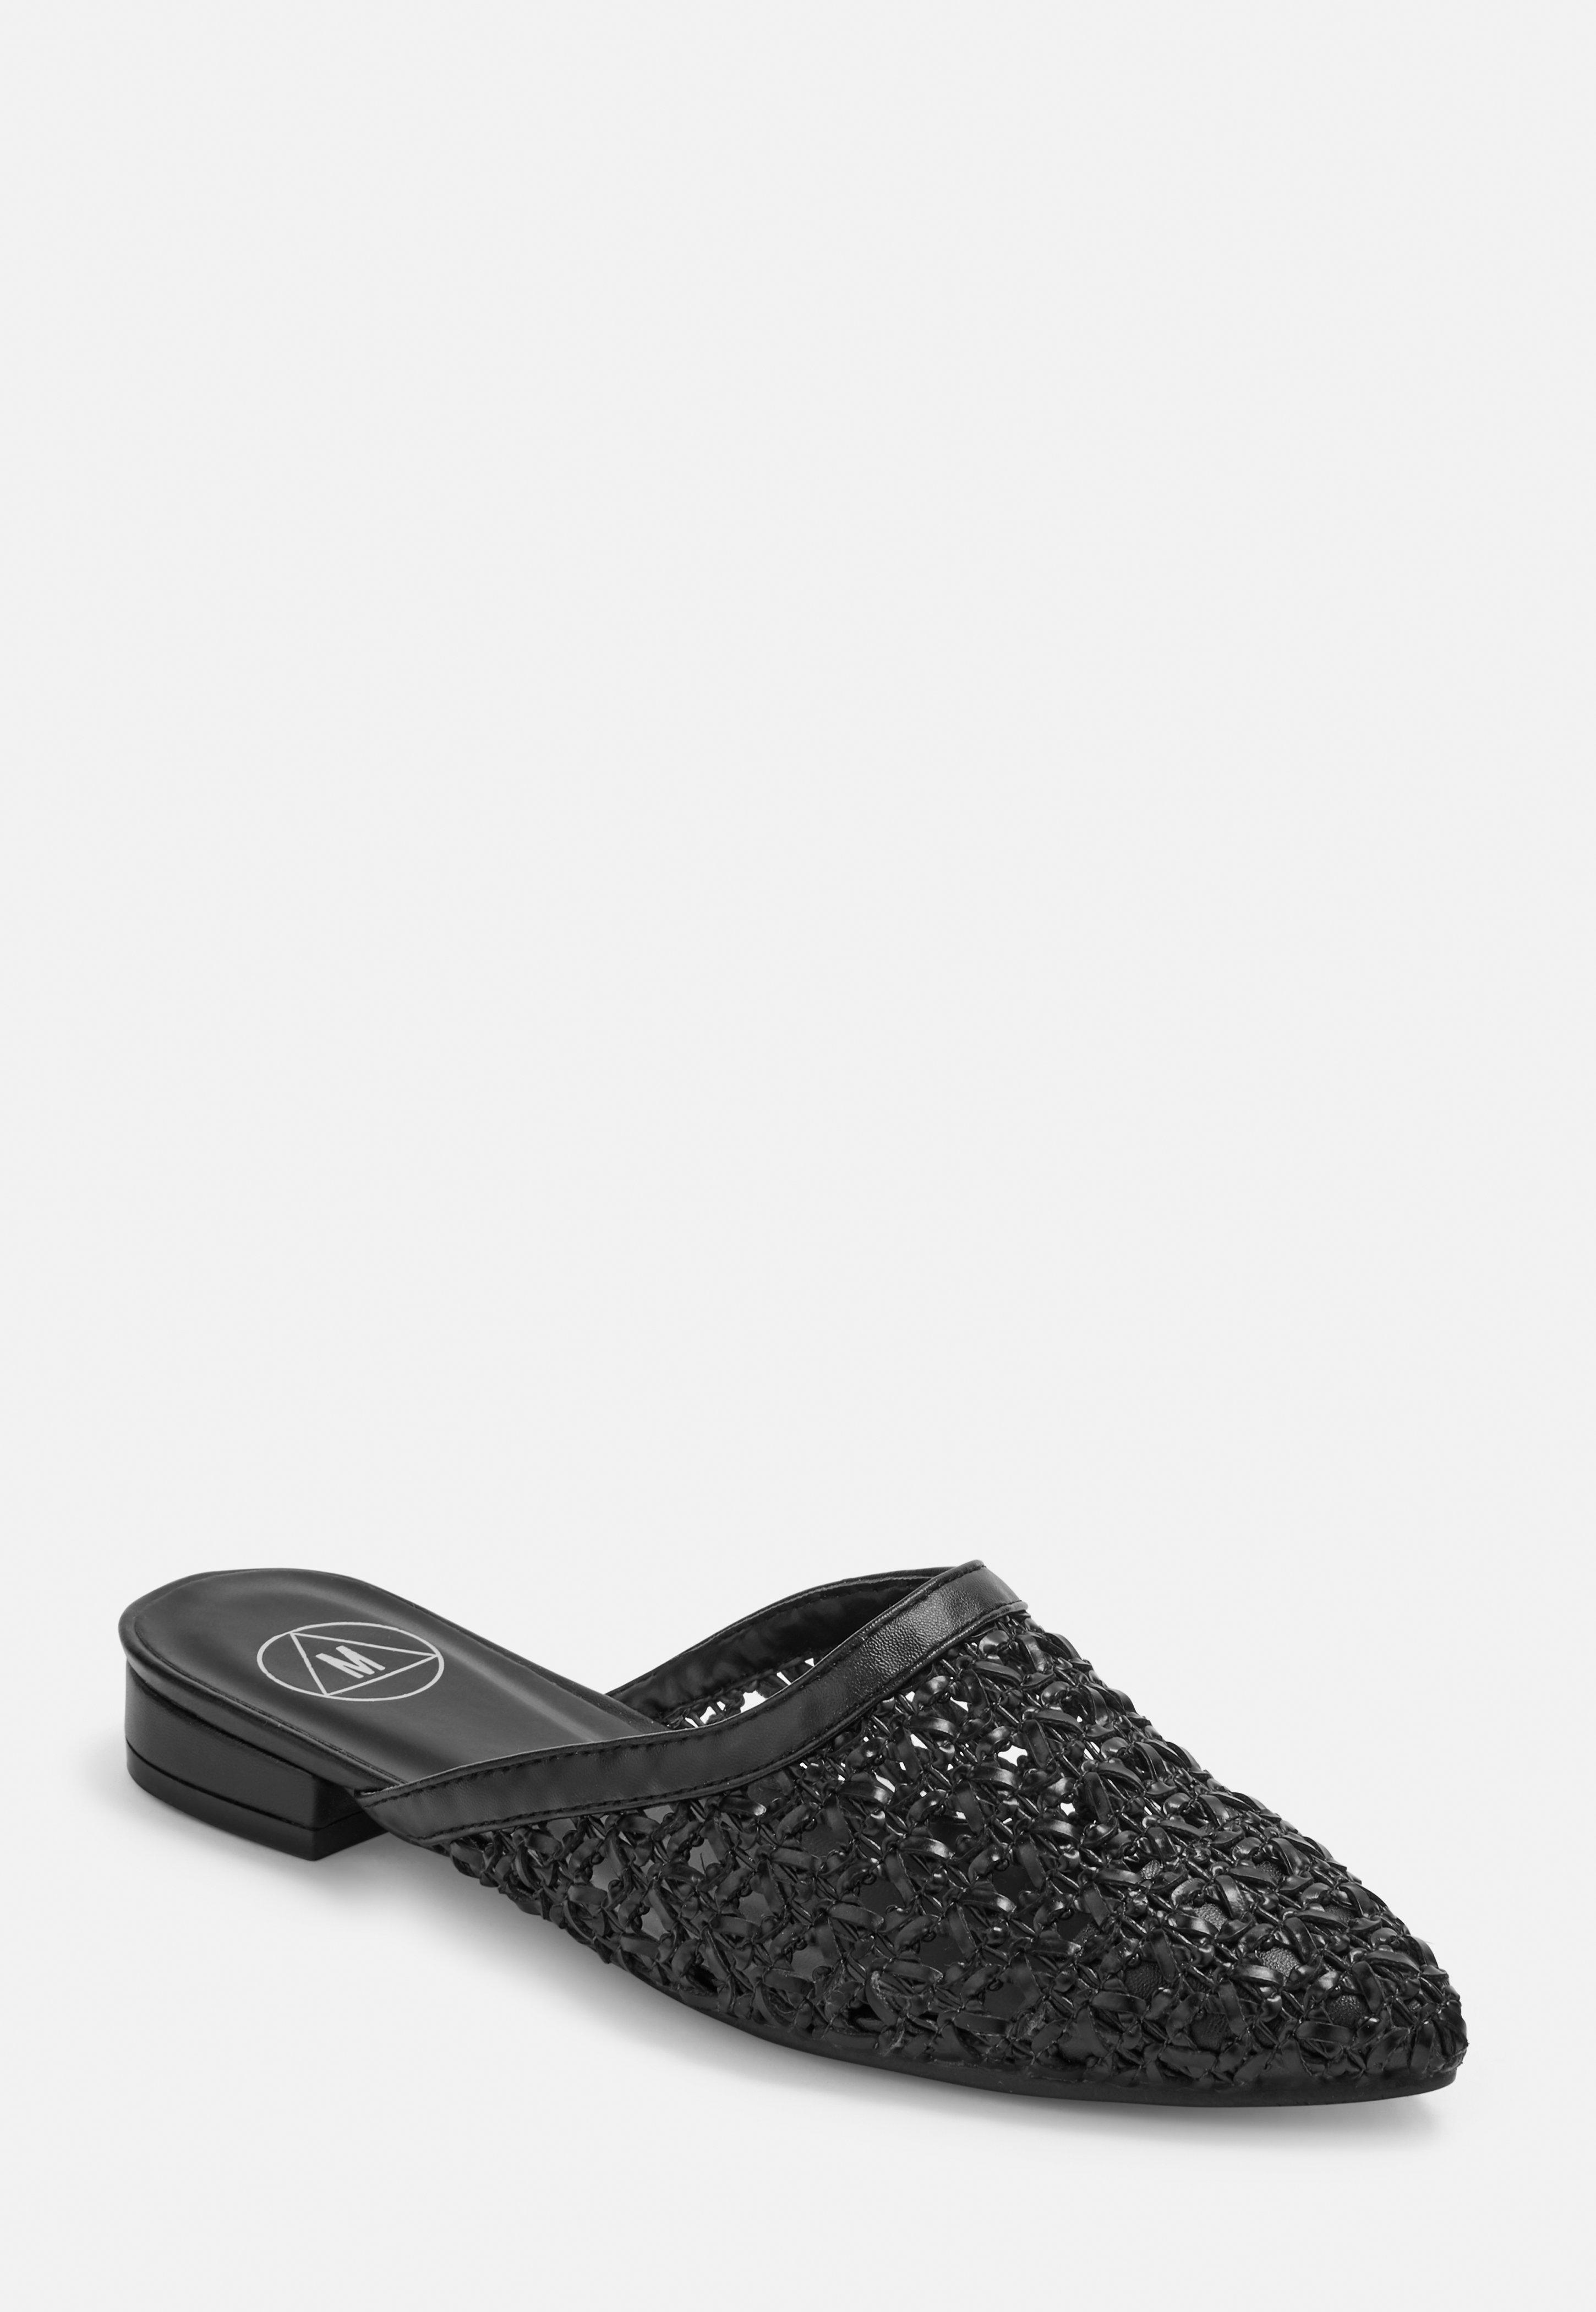 8a585fa823a Flat Shoes - Shop Flats for Women Online